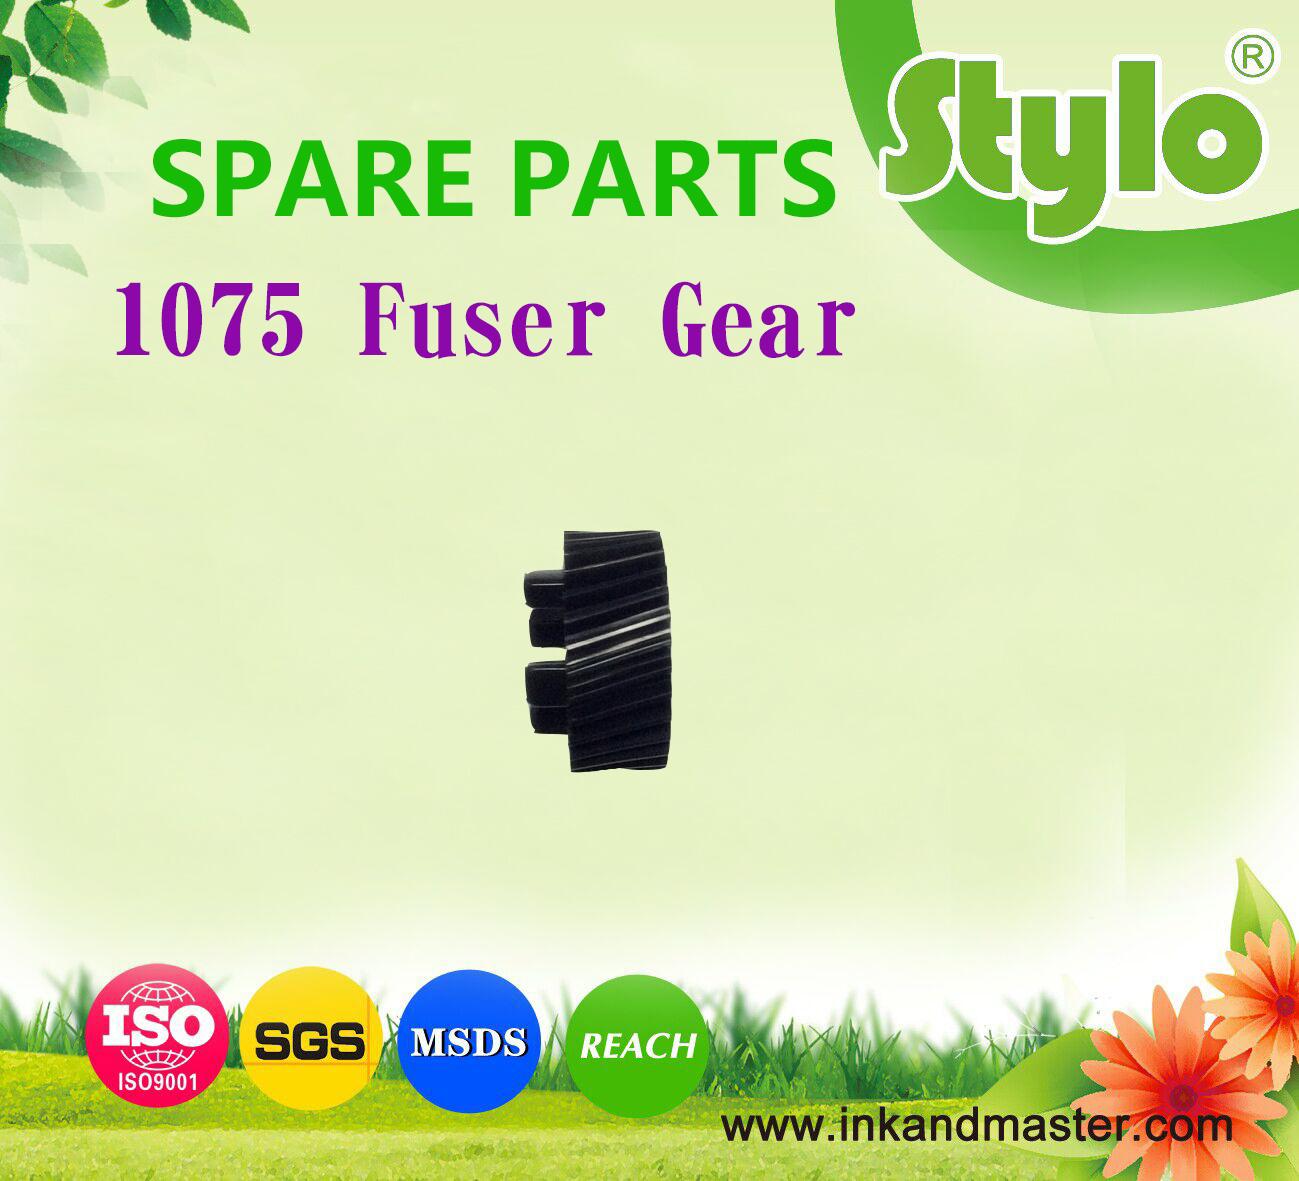 Copier Parts Ab01-2318 Fuser Gear 29t